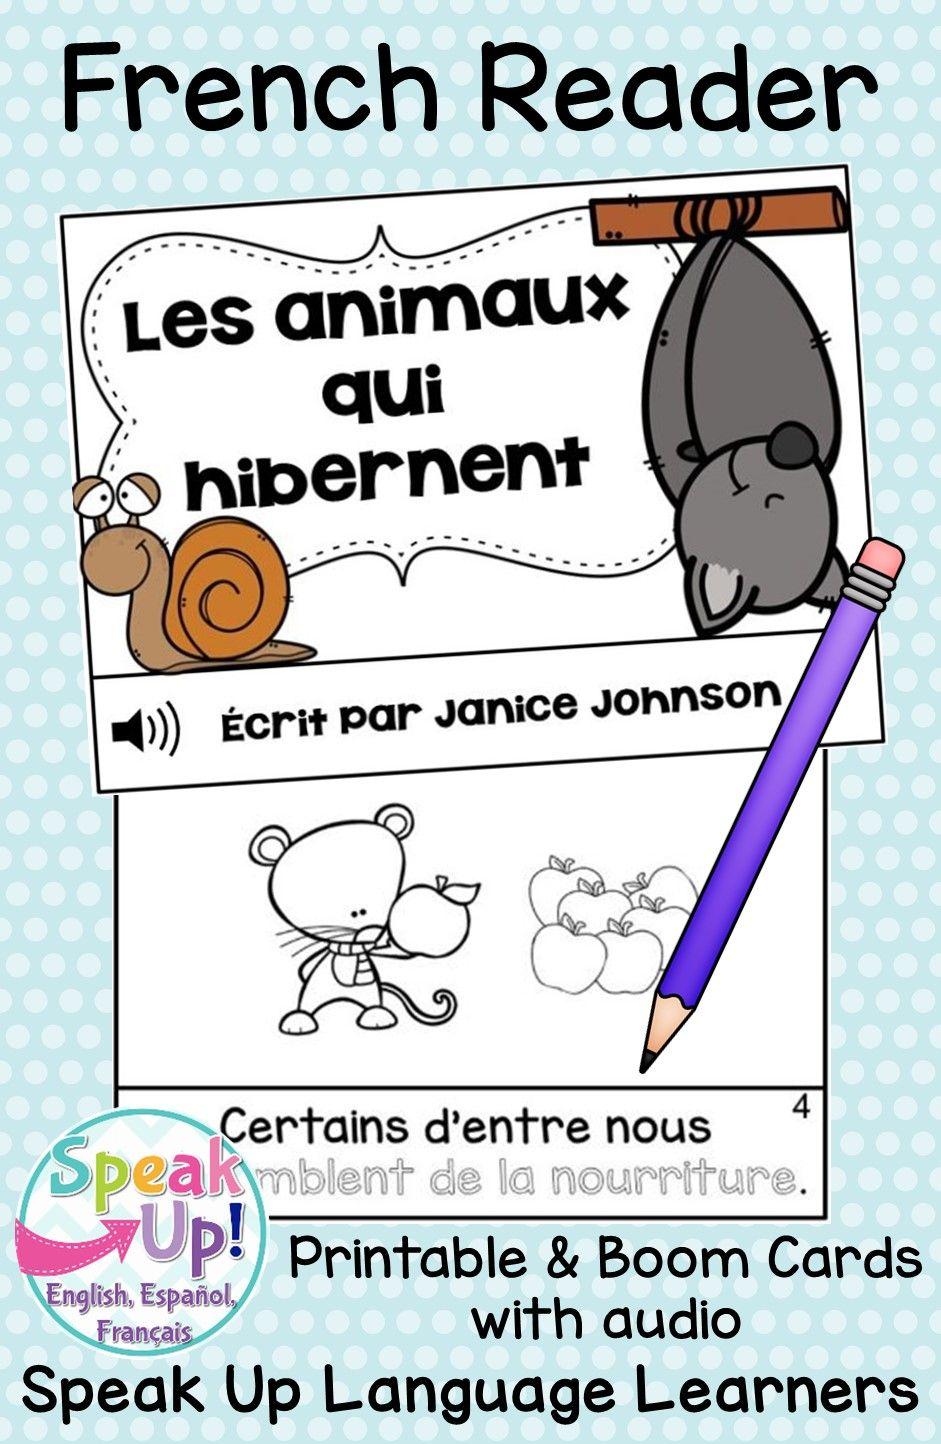 Les Animaux Qui Hibernent : animaux, hibernent, Animaux, Hibernent, French, Reader, Cards, Digital, Version, Audio, Printable, Emergent, Readers,, Reader,, Animals, Hibernate